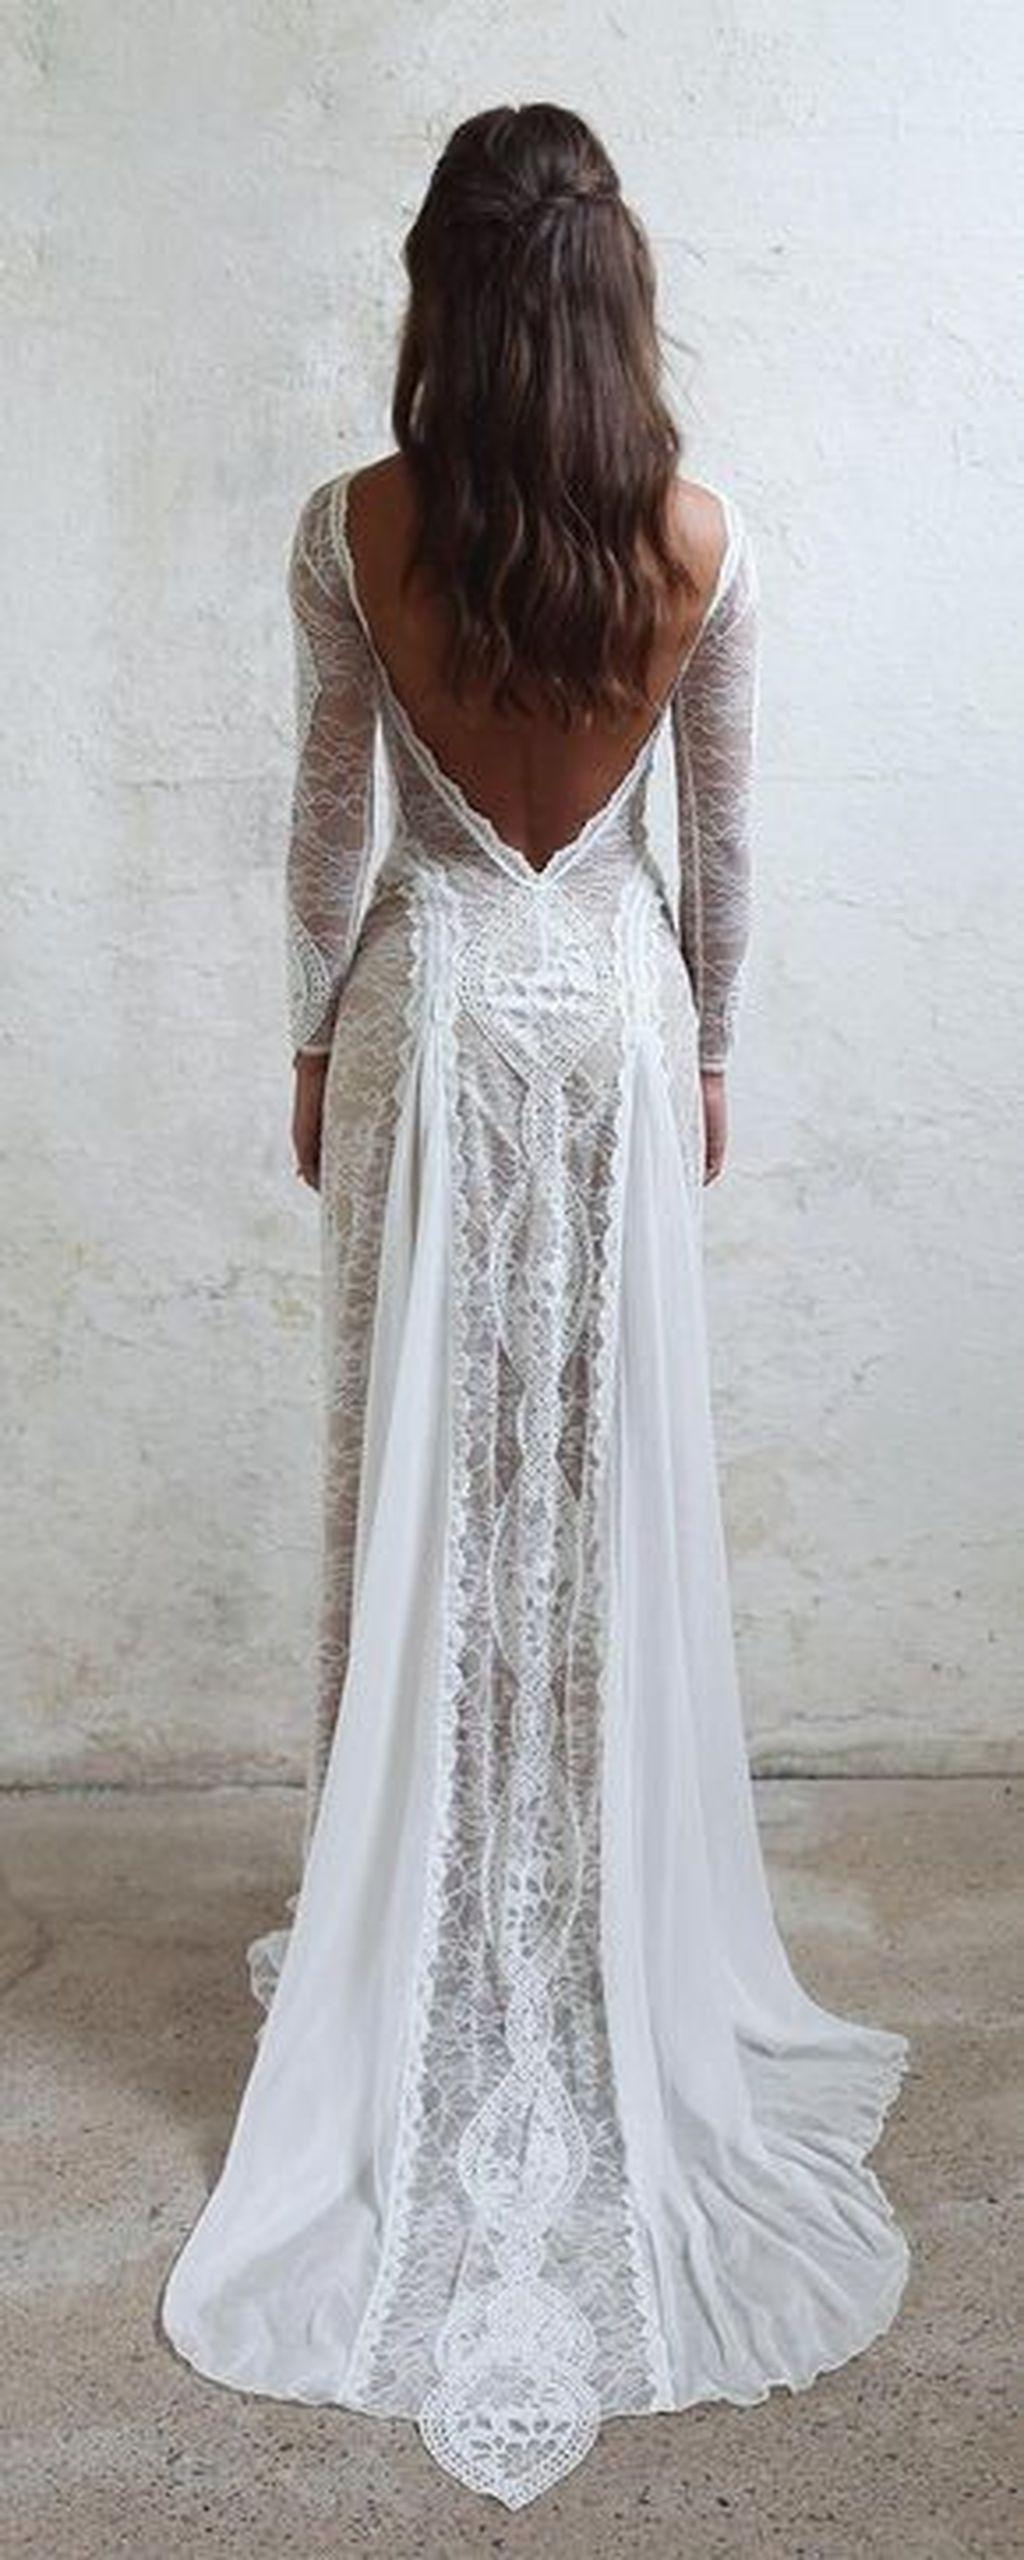 Pin by carolyn addeo on dreams pinterest dress ideas bohemian